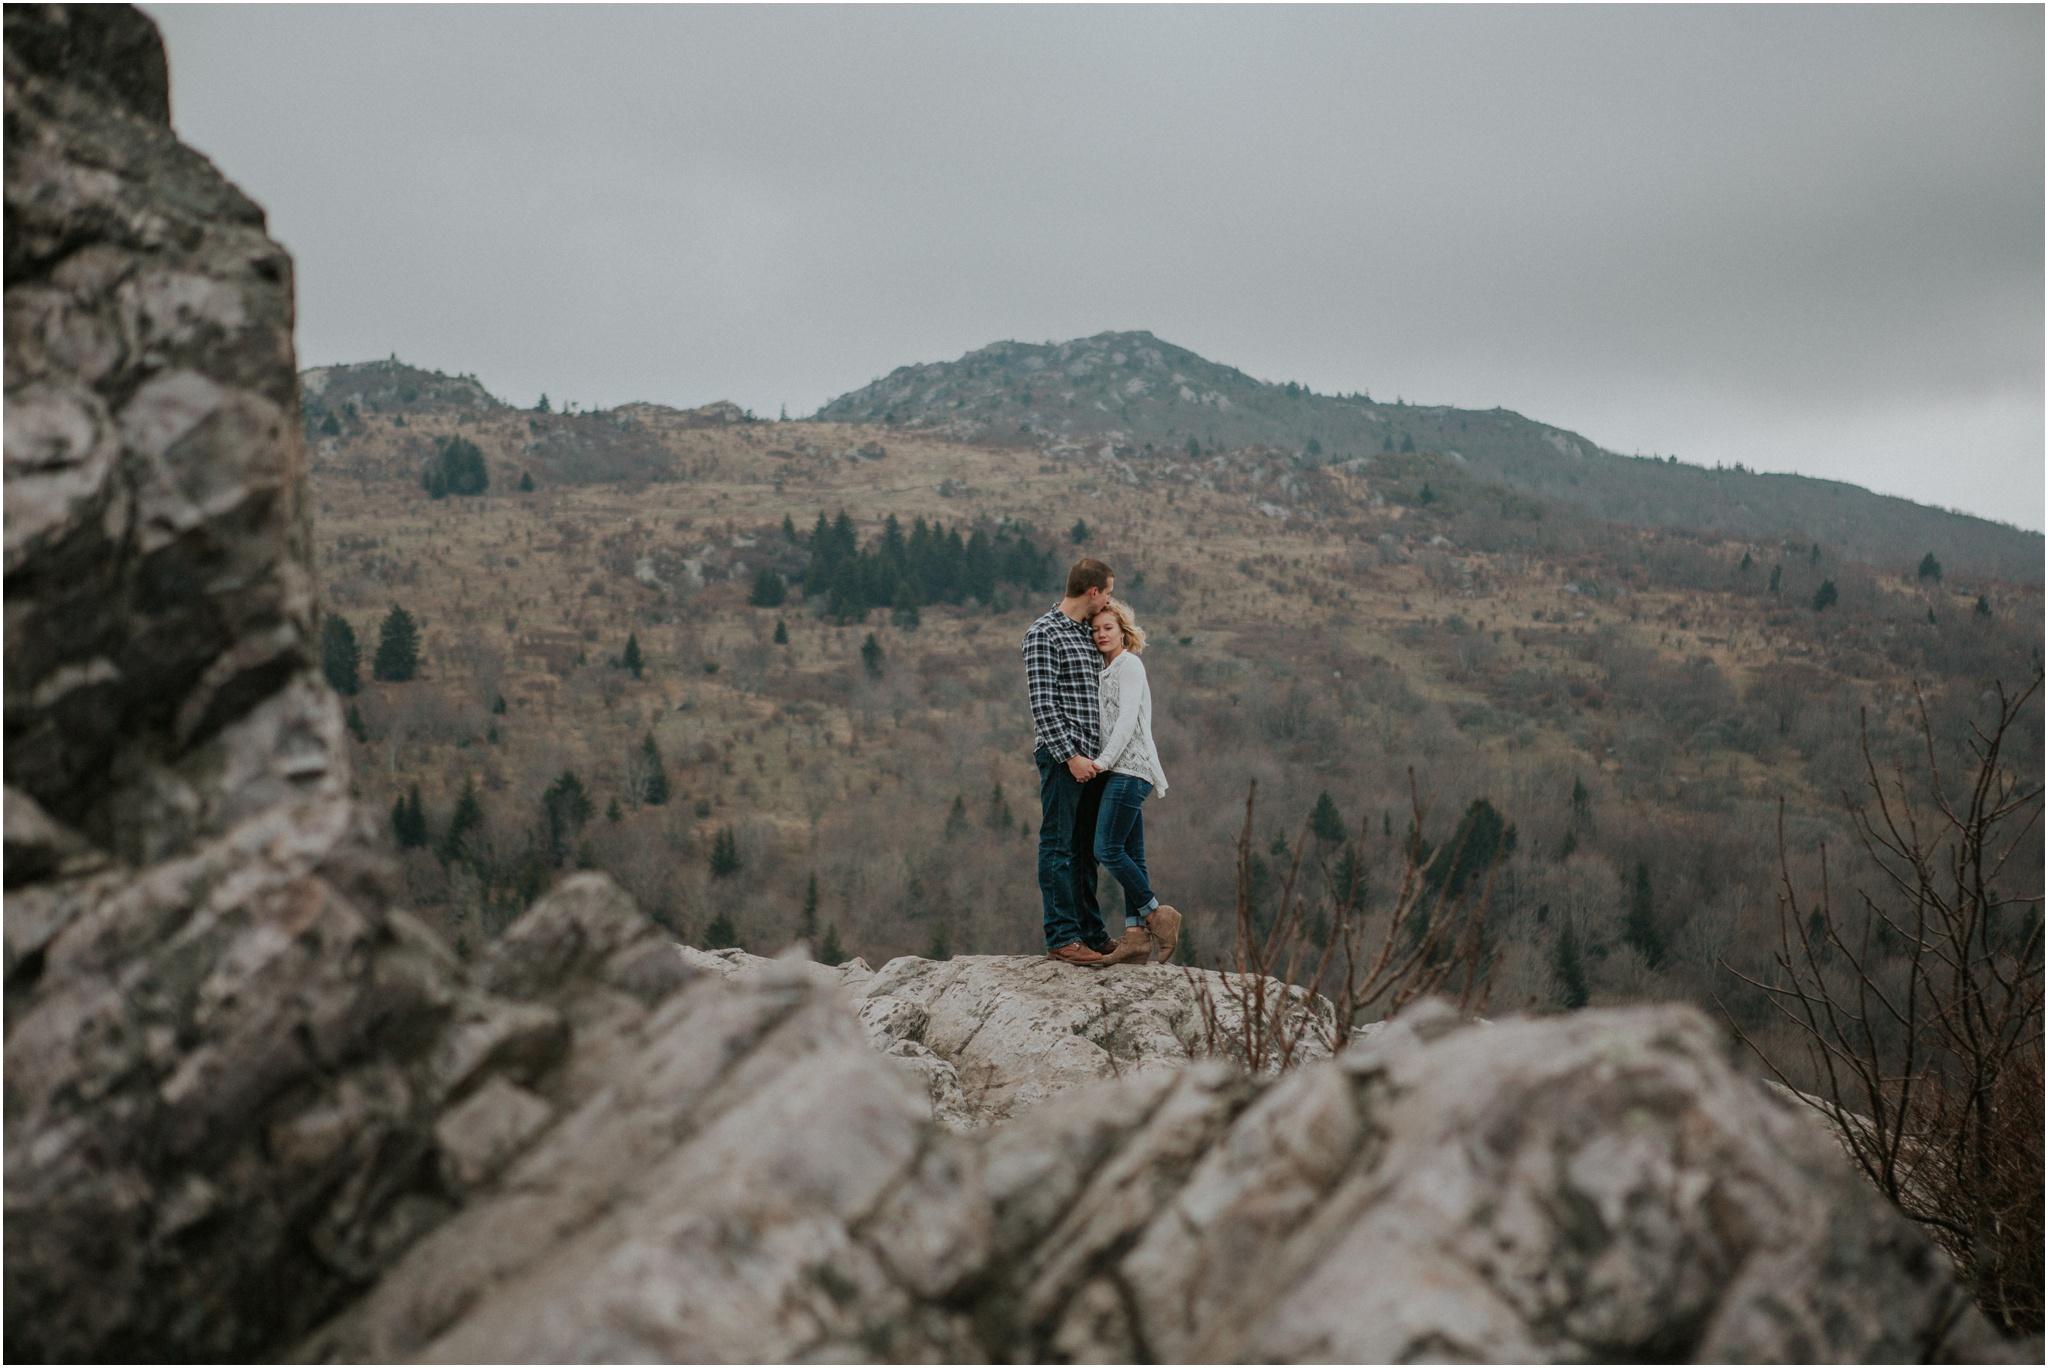 grayson-highlands-engagement-session-foggy-mountain-rustic-appalachian-virginia-katy-sergent-photography_0032.jpg